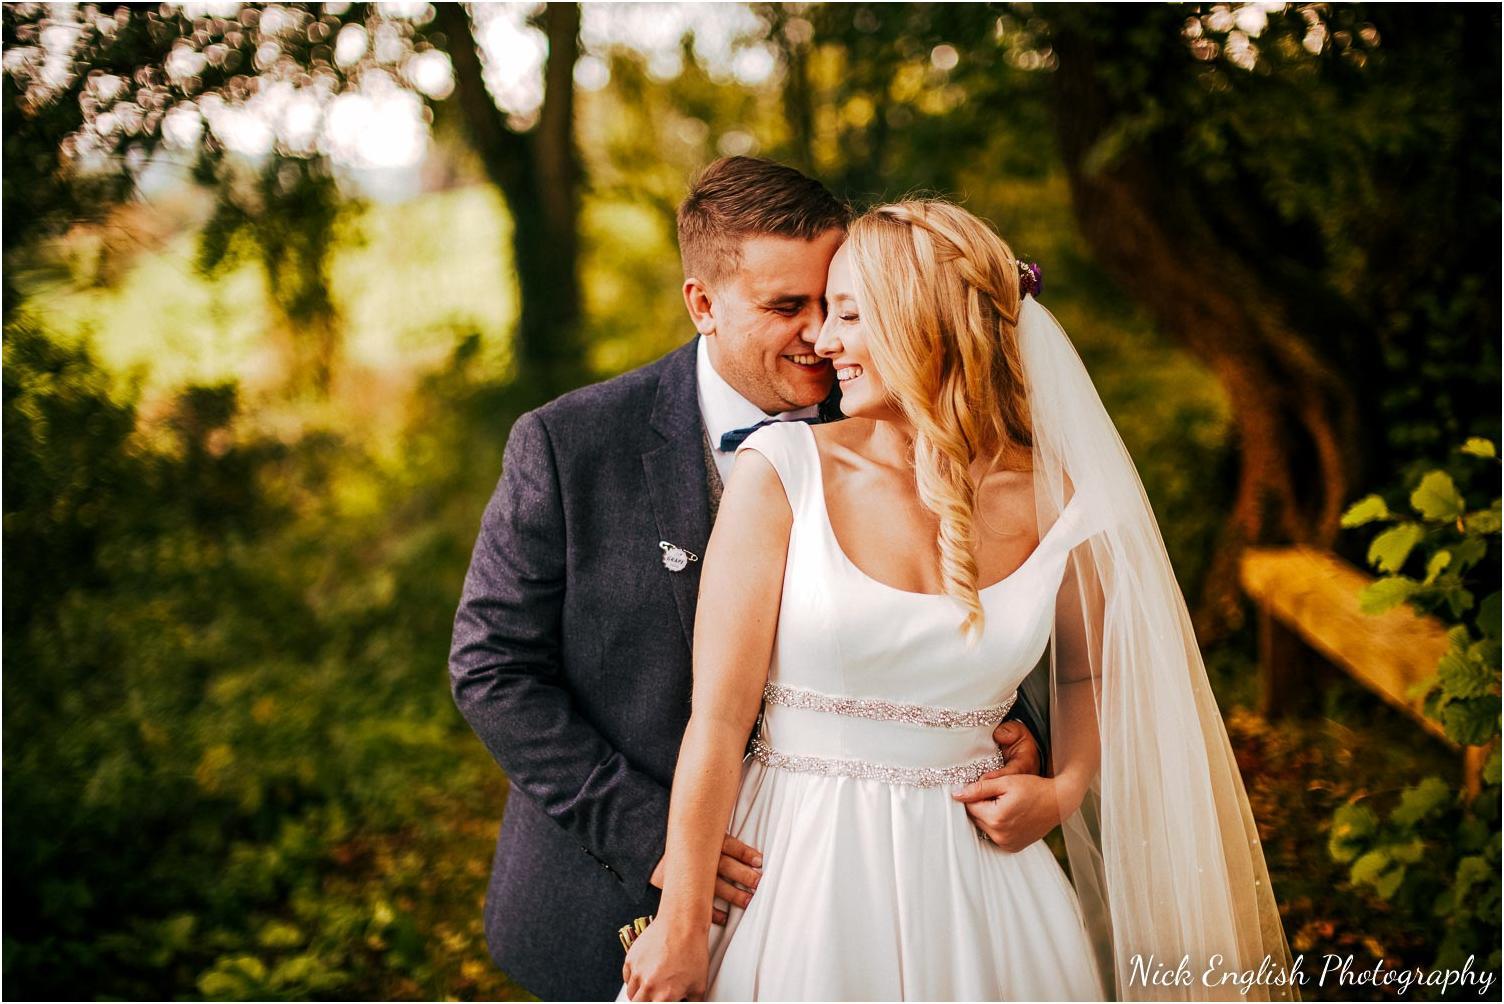 The_Ashes_Barn_Endon_Stoke_Wedding_Photographer-74.jpg